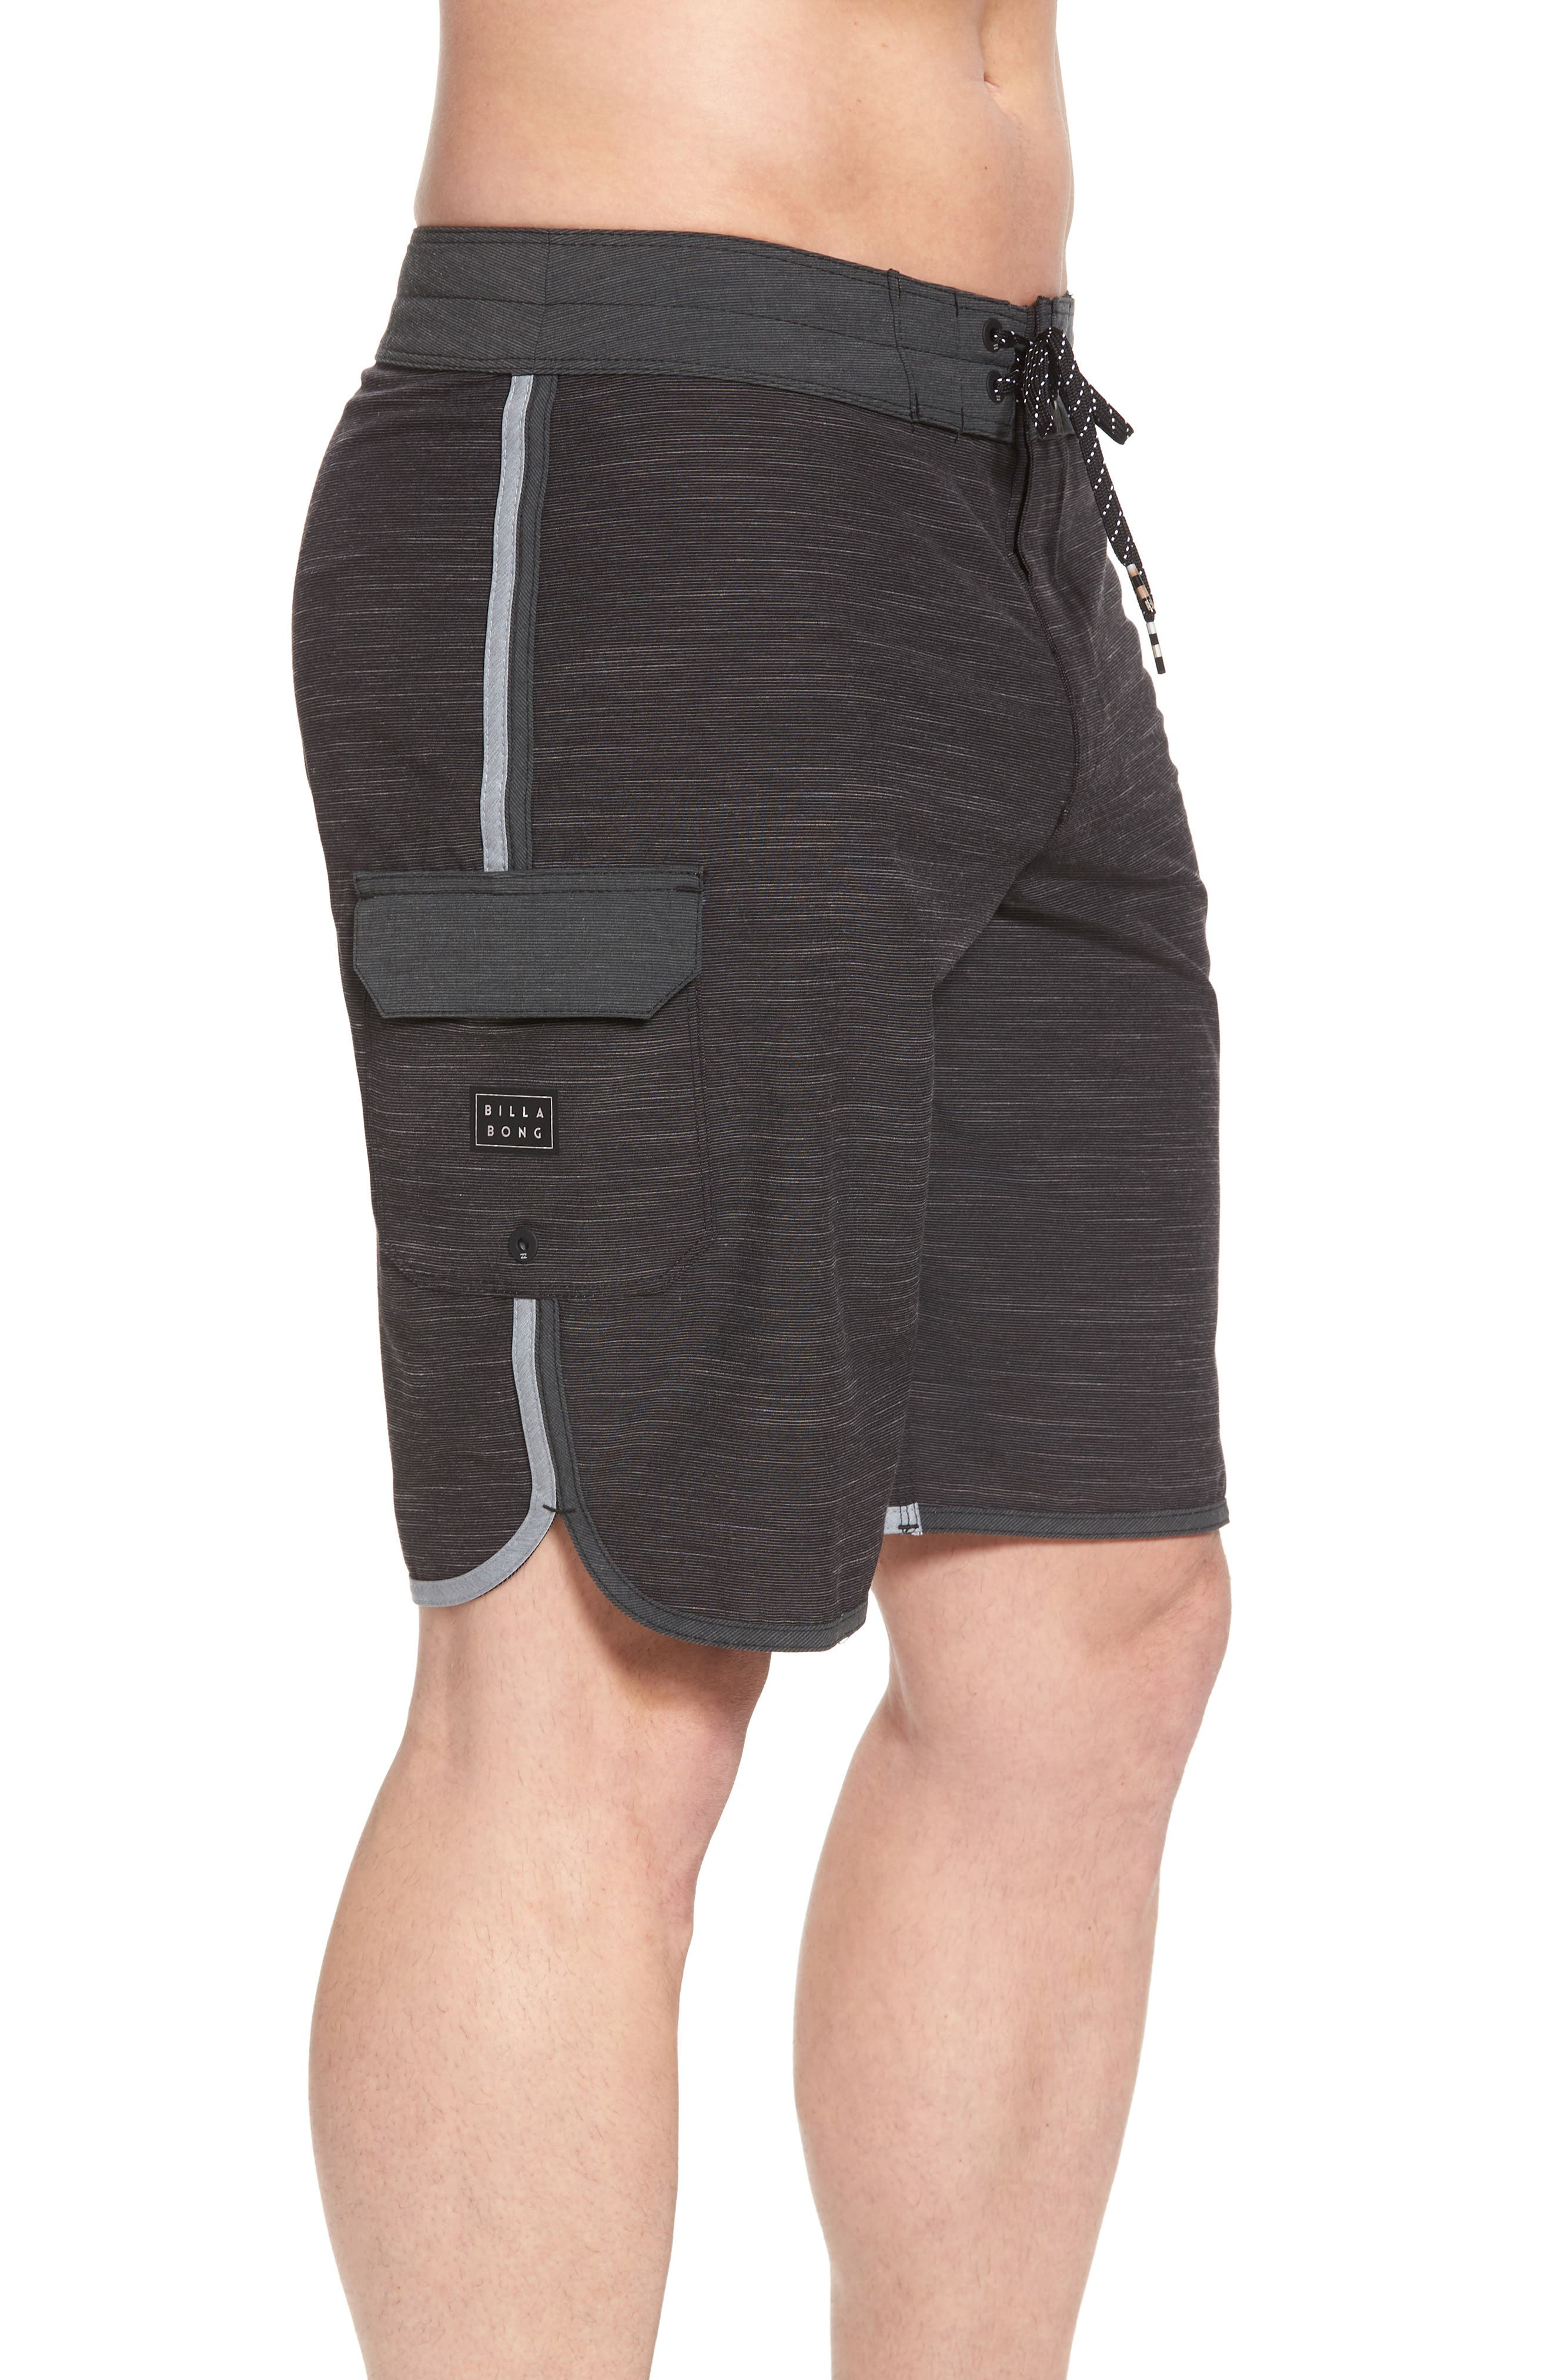 73 X Short Board Shorts,                             Alternate thumbnail 3, color,                             001